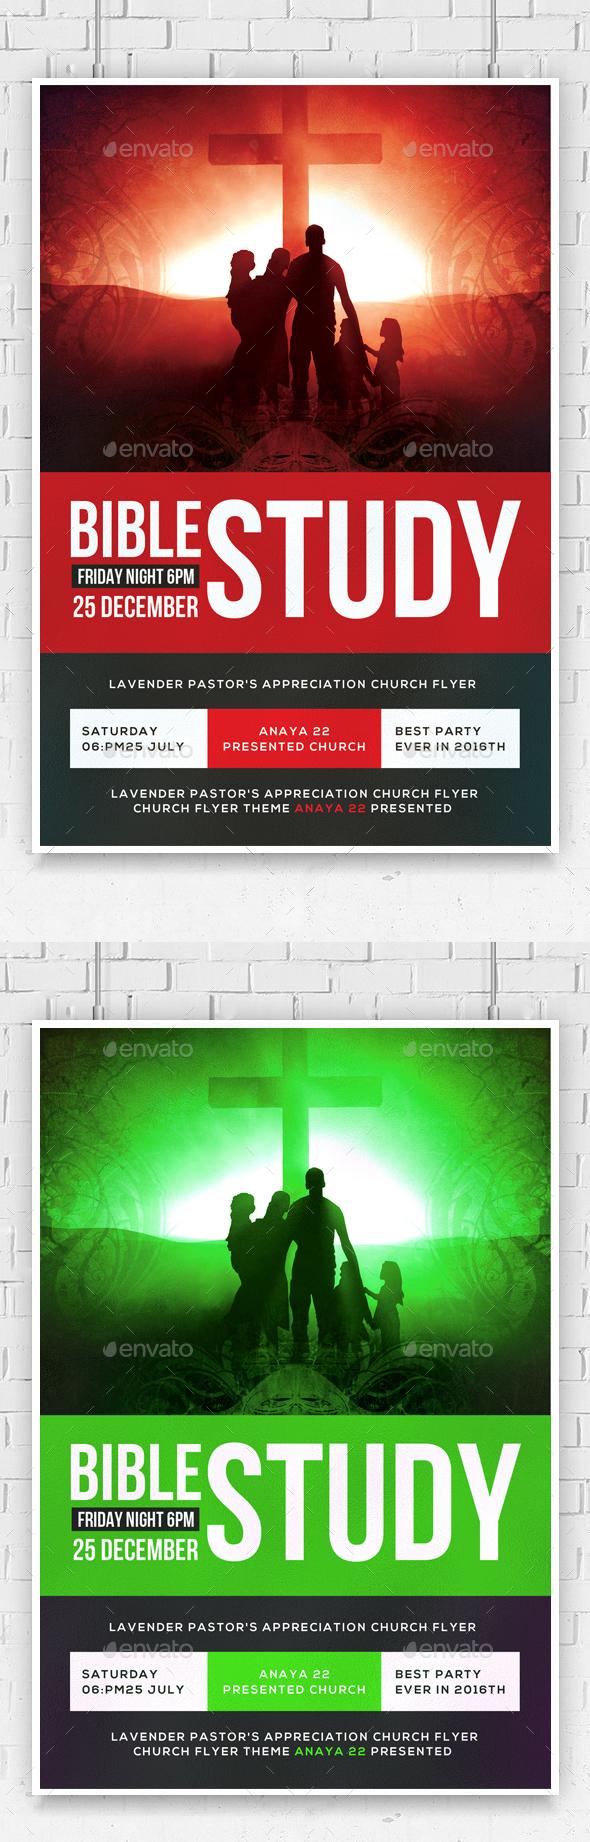 The Bible Study Church Flyer  - Church Flyers